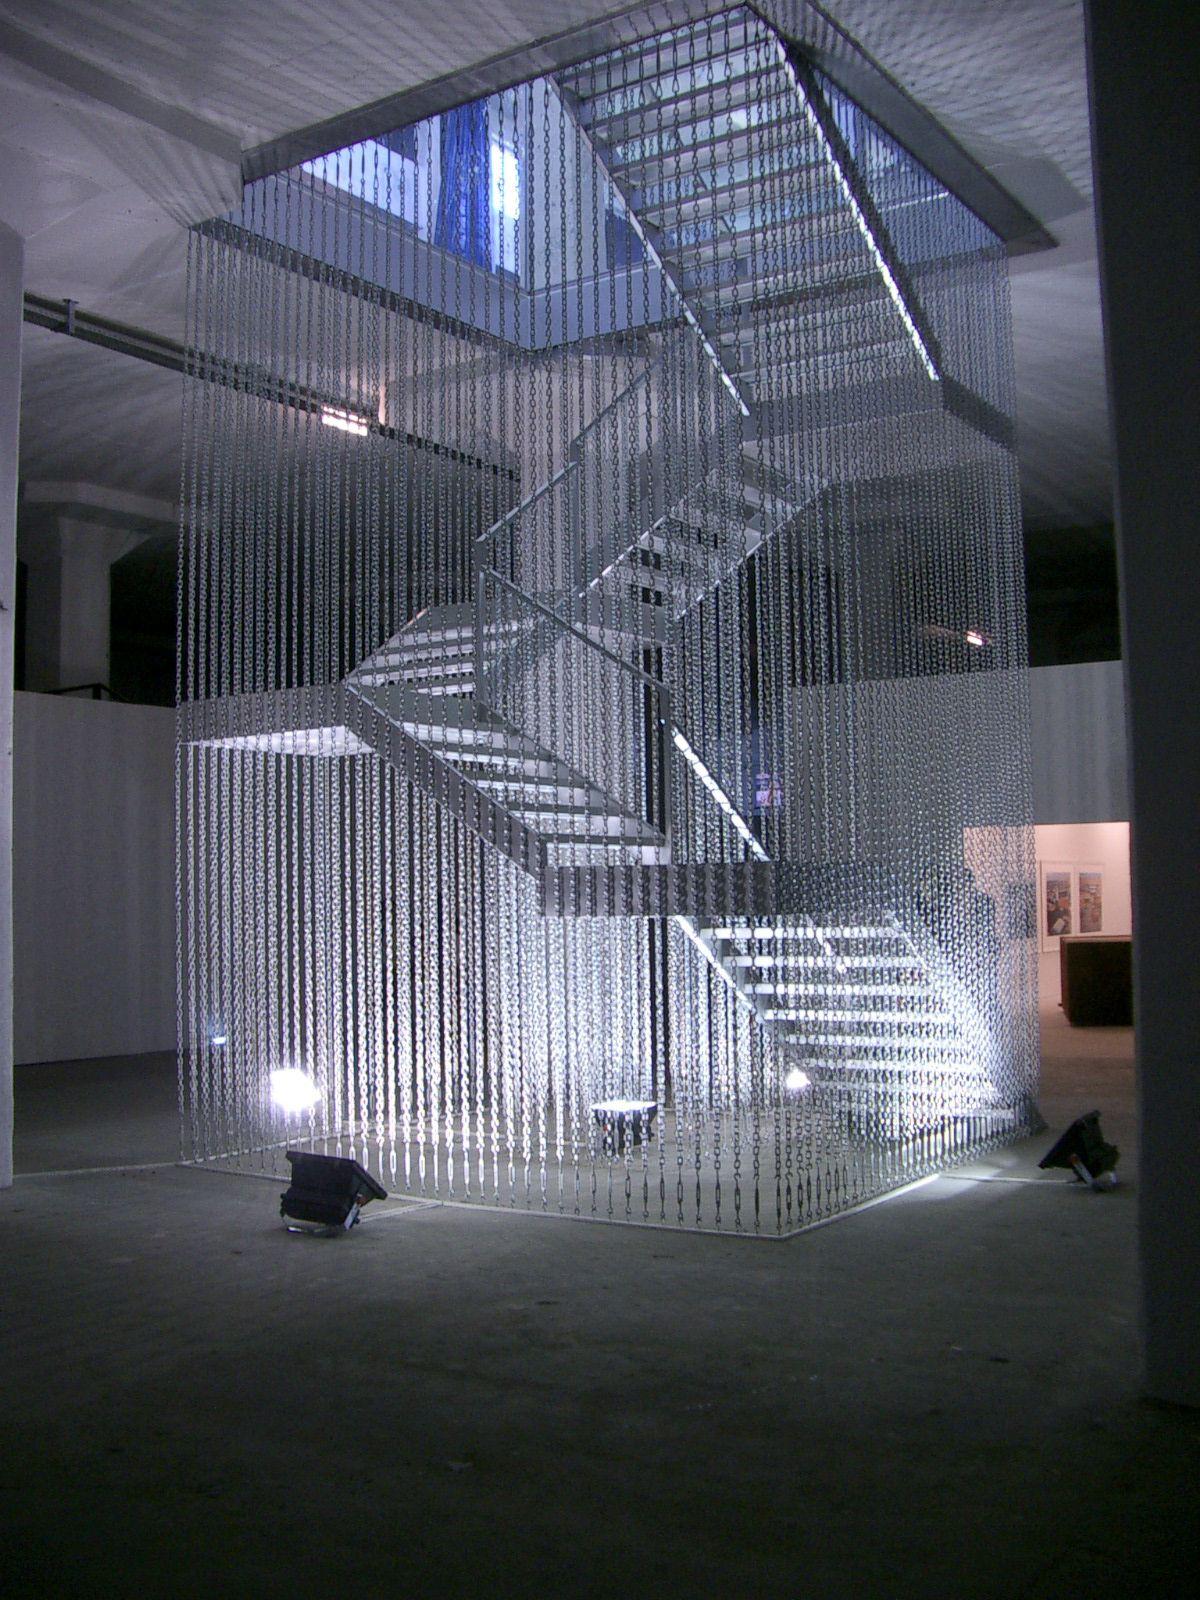 MONICA BONVICINI Stairway to Hell